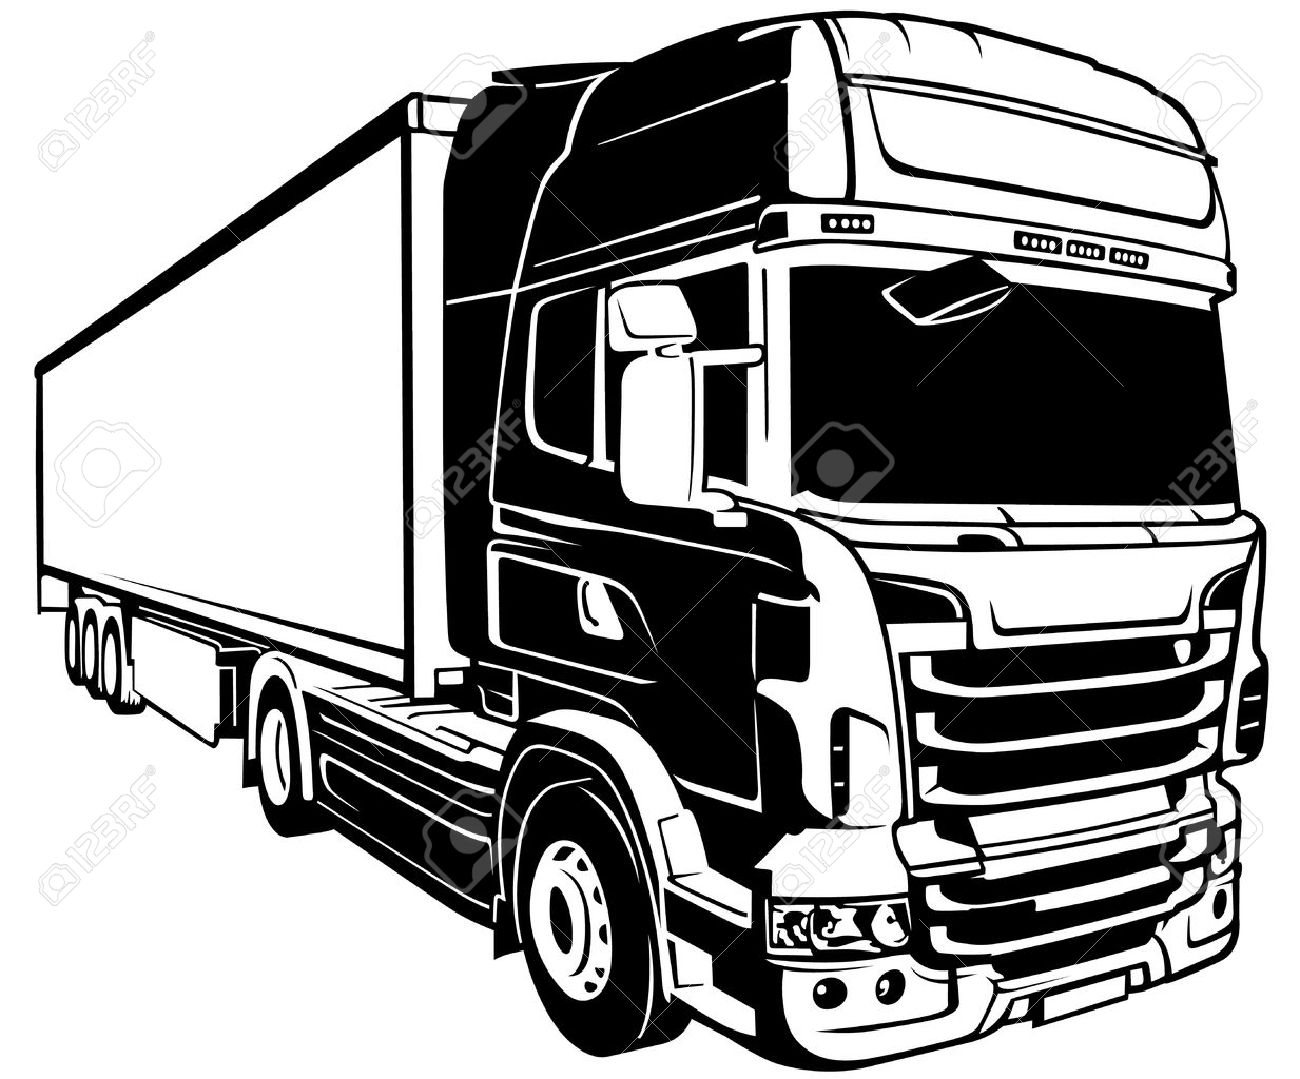 1300x1079 Trailer Truck Black Outlined Illustration Vector Royalty Free